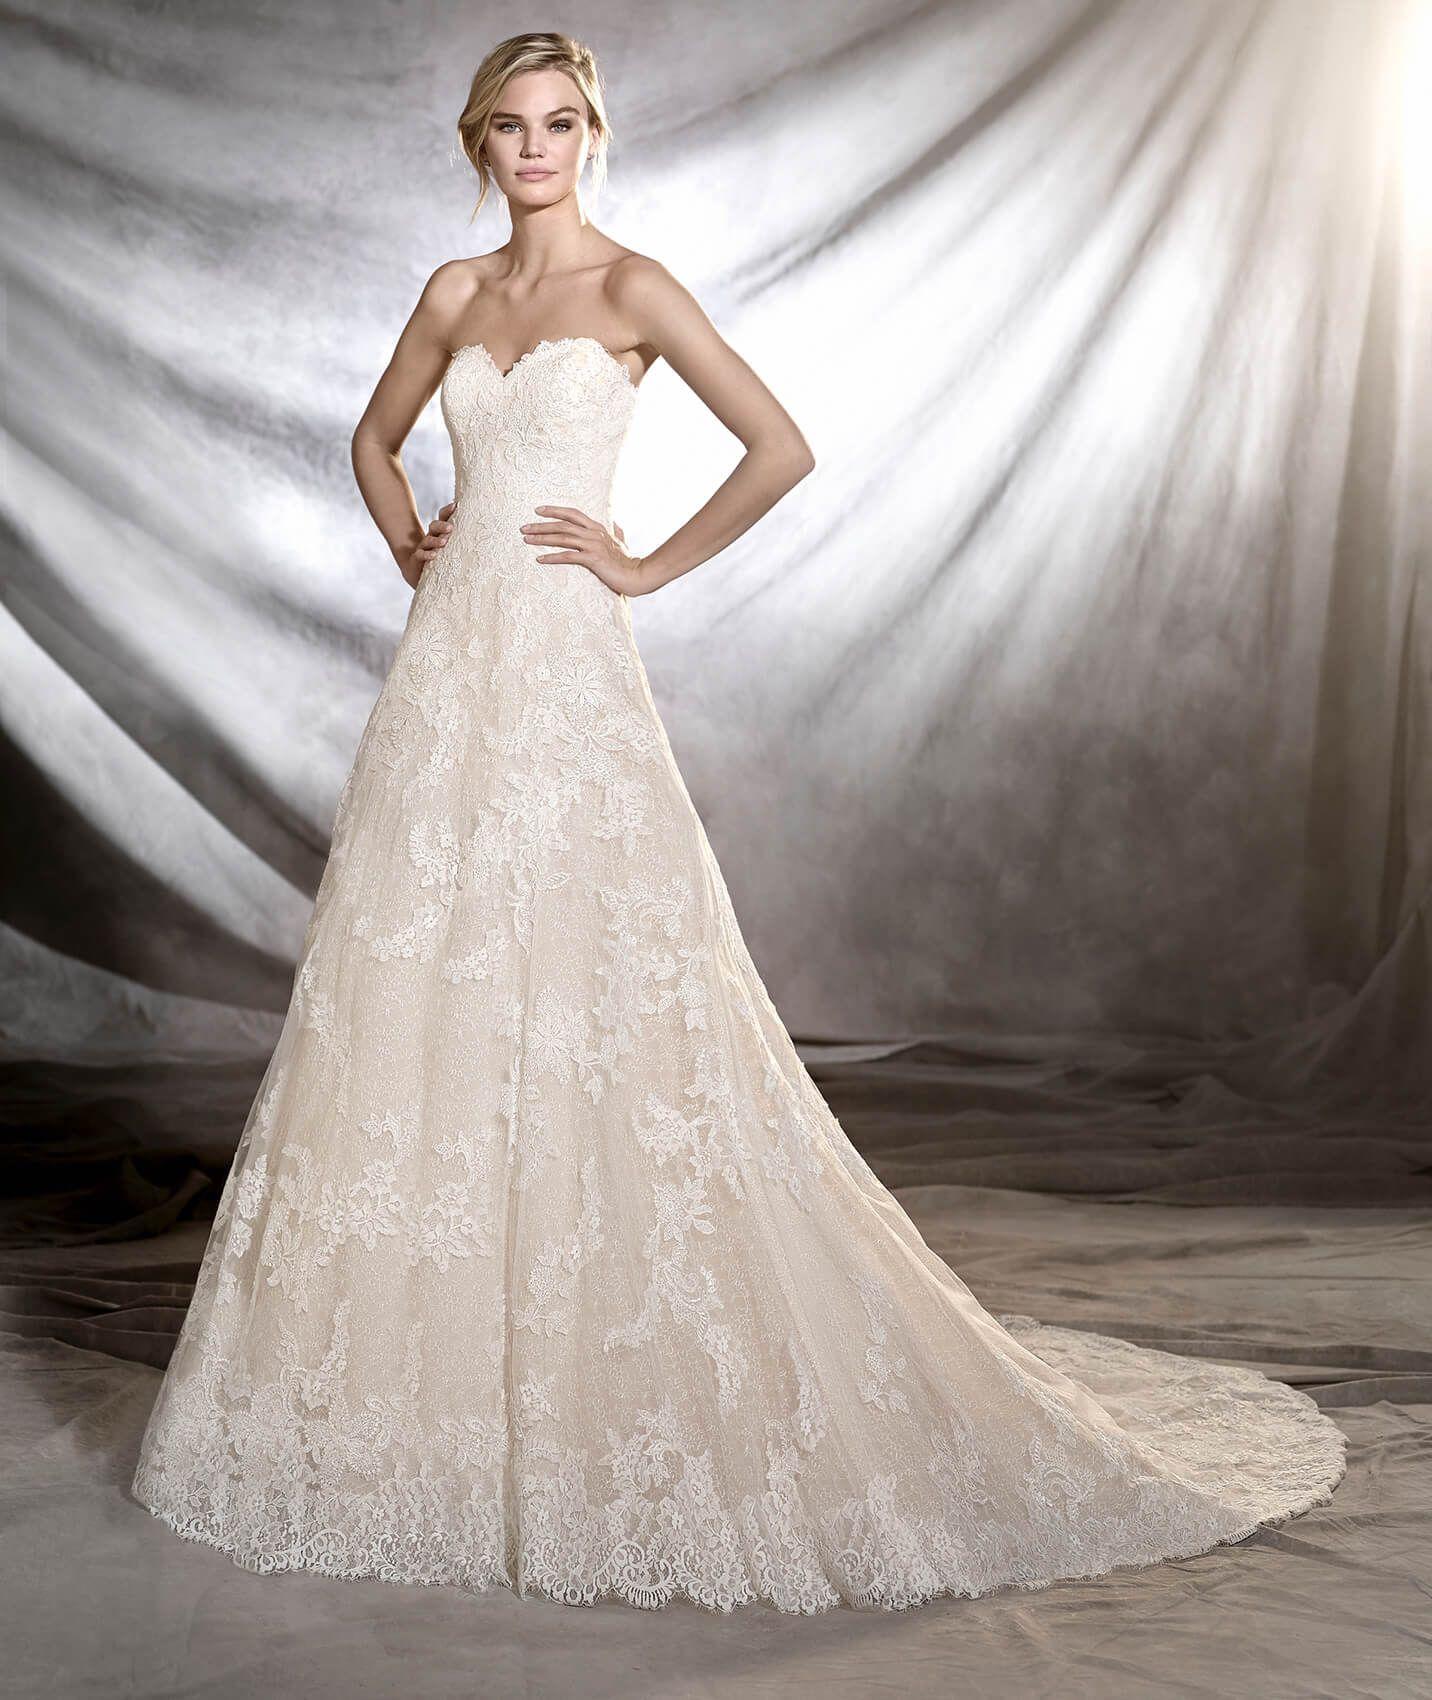 ONIA - Princess style wedding dress | Pinterest | Brautkleid ...